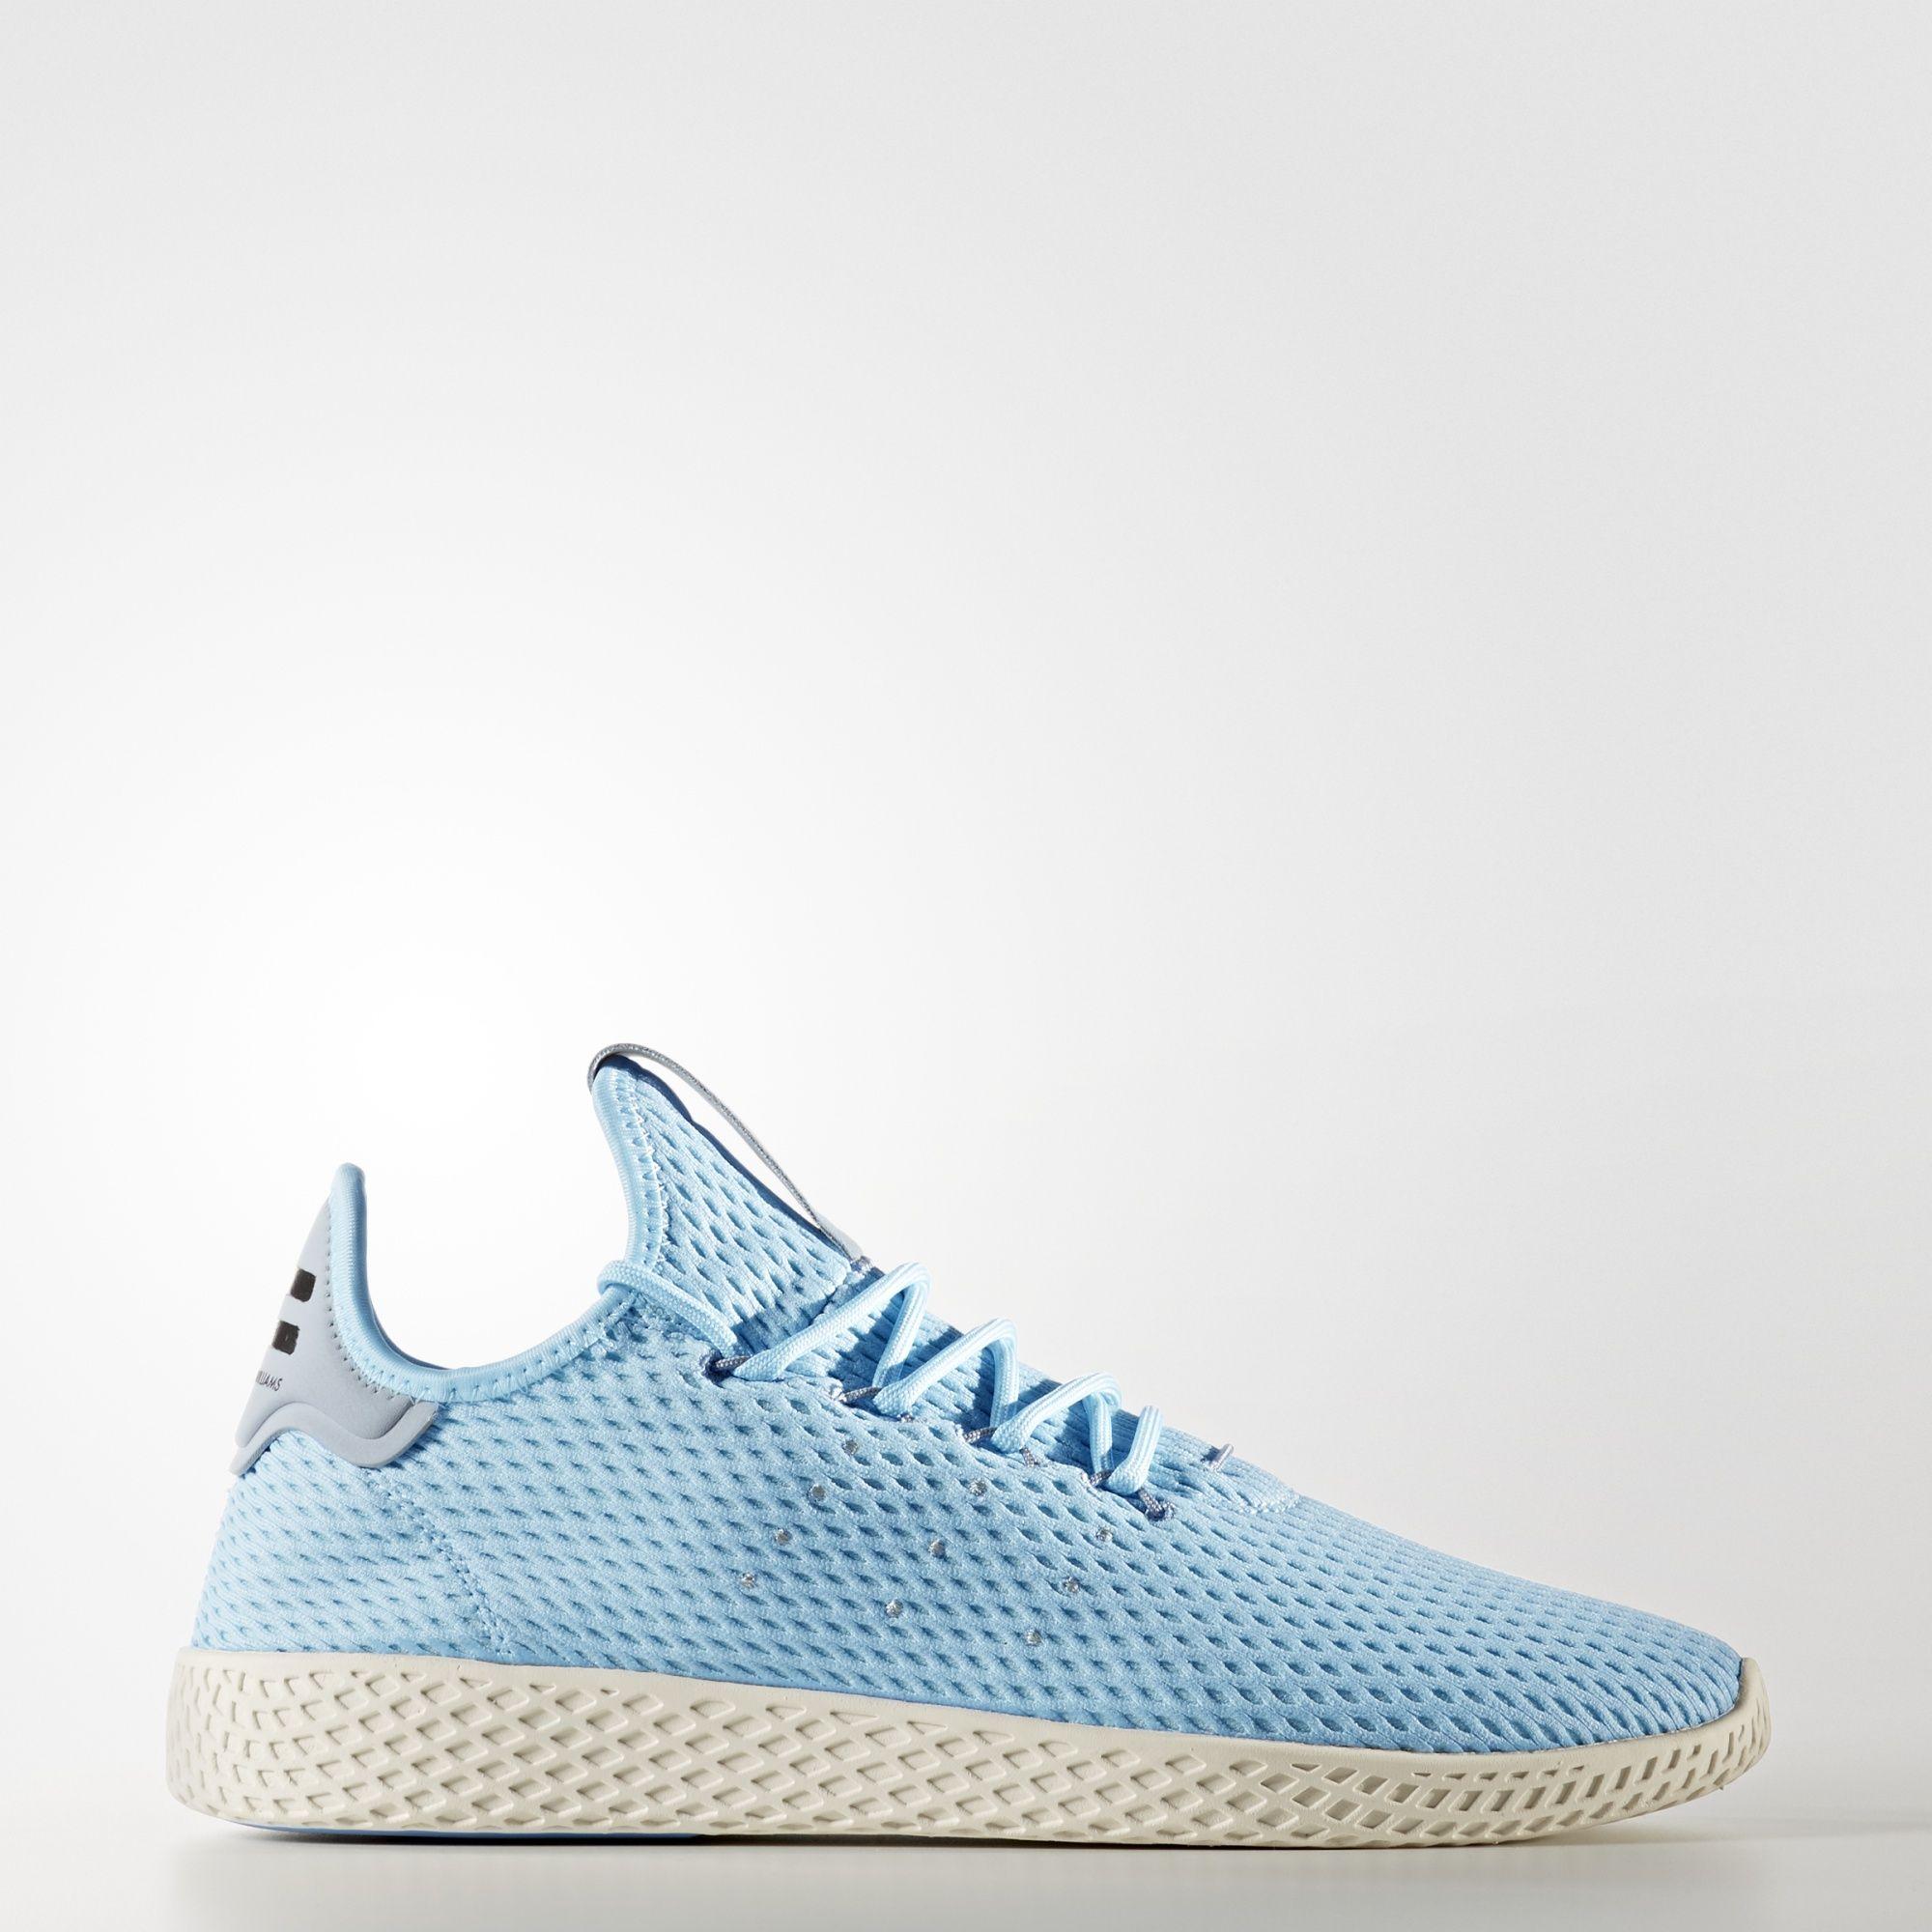 123b090cf A design collaboration with adidas Originals